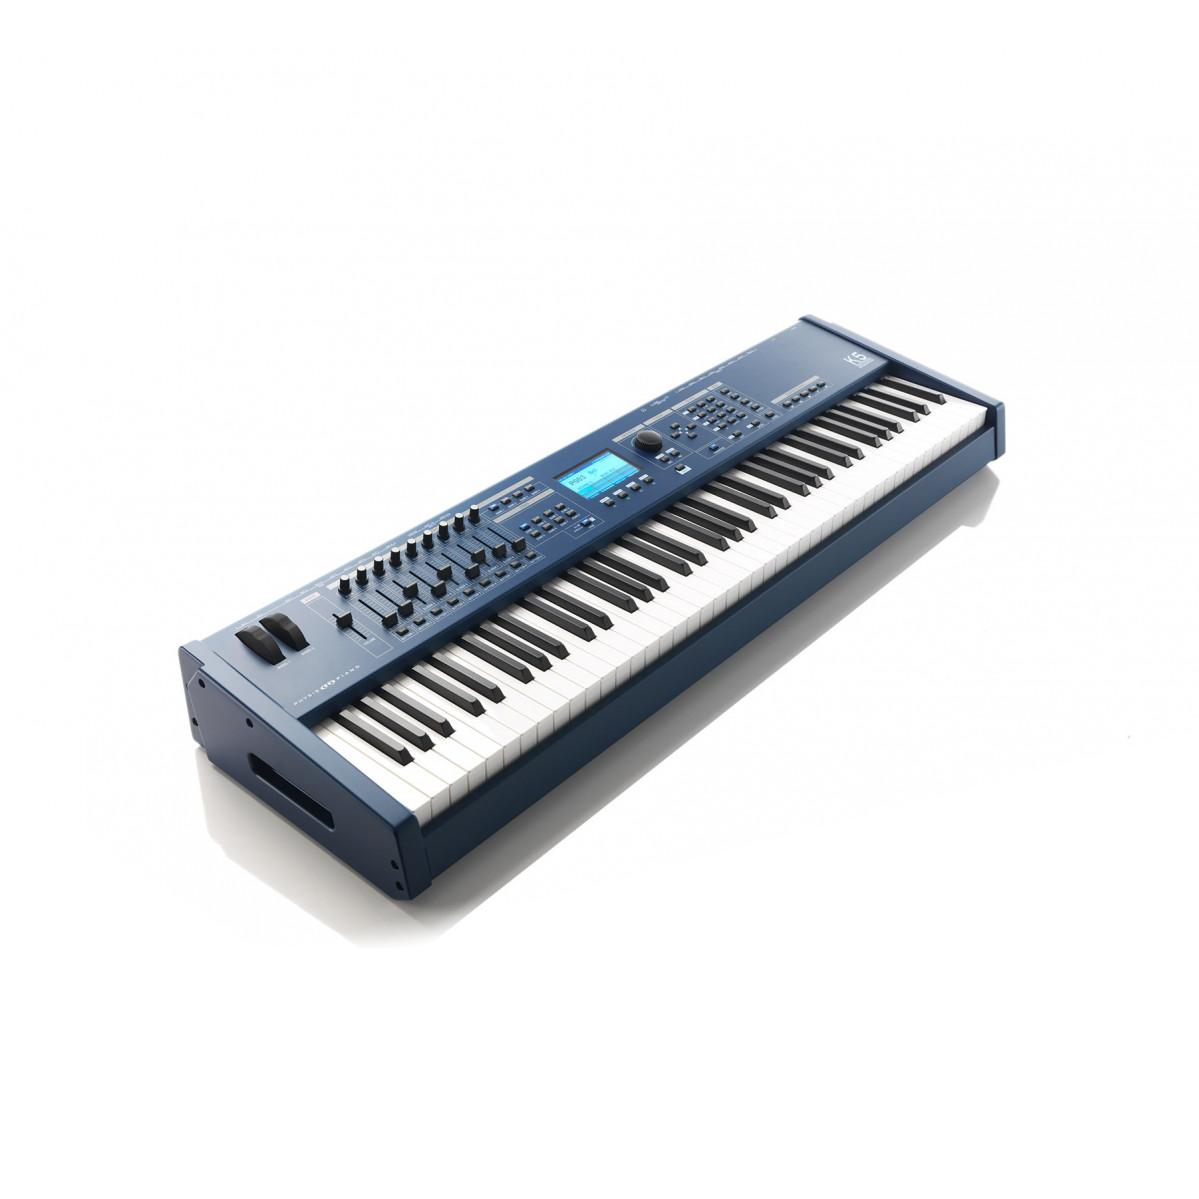 Viscount Physis Piano K5 product display